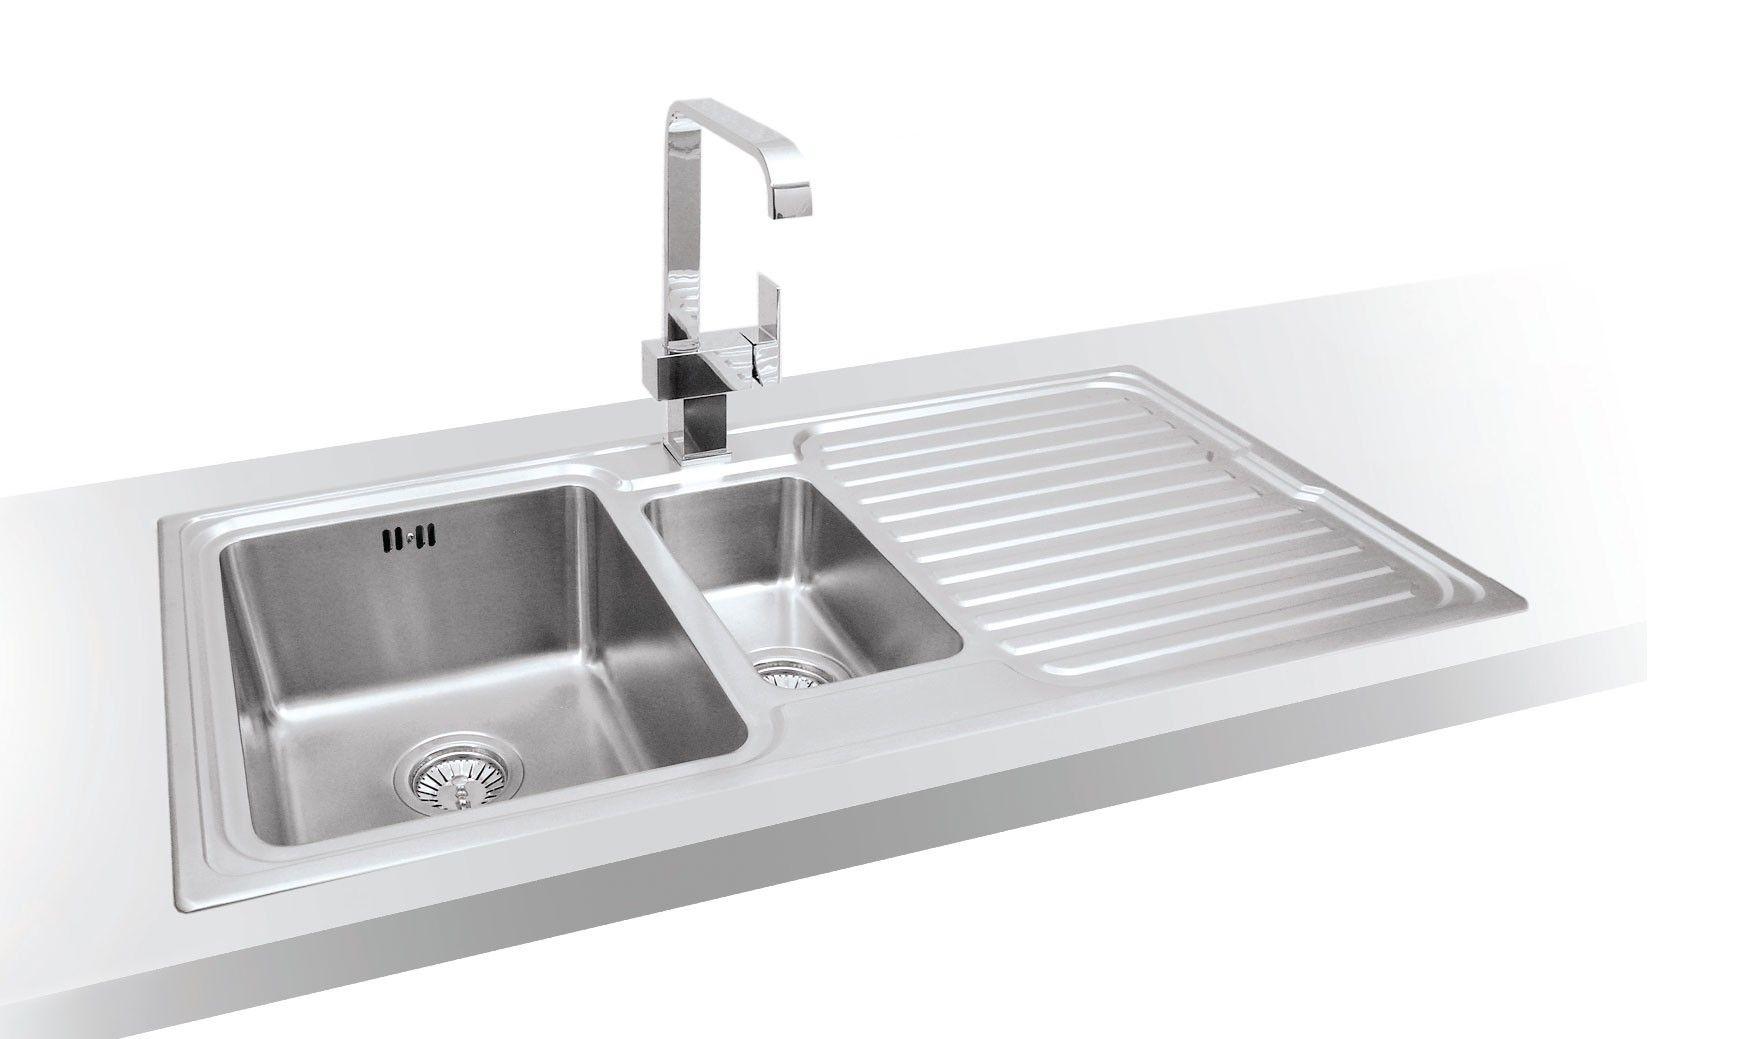 Tiber 1 5 Bowl Single Drainer Designer Inset Sink Inset Sink Sink Sink Drainer